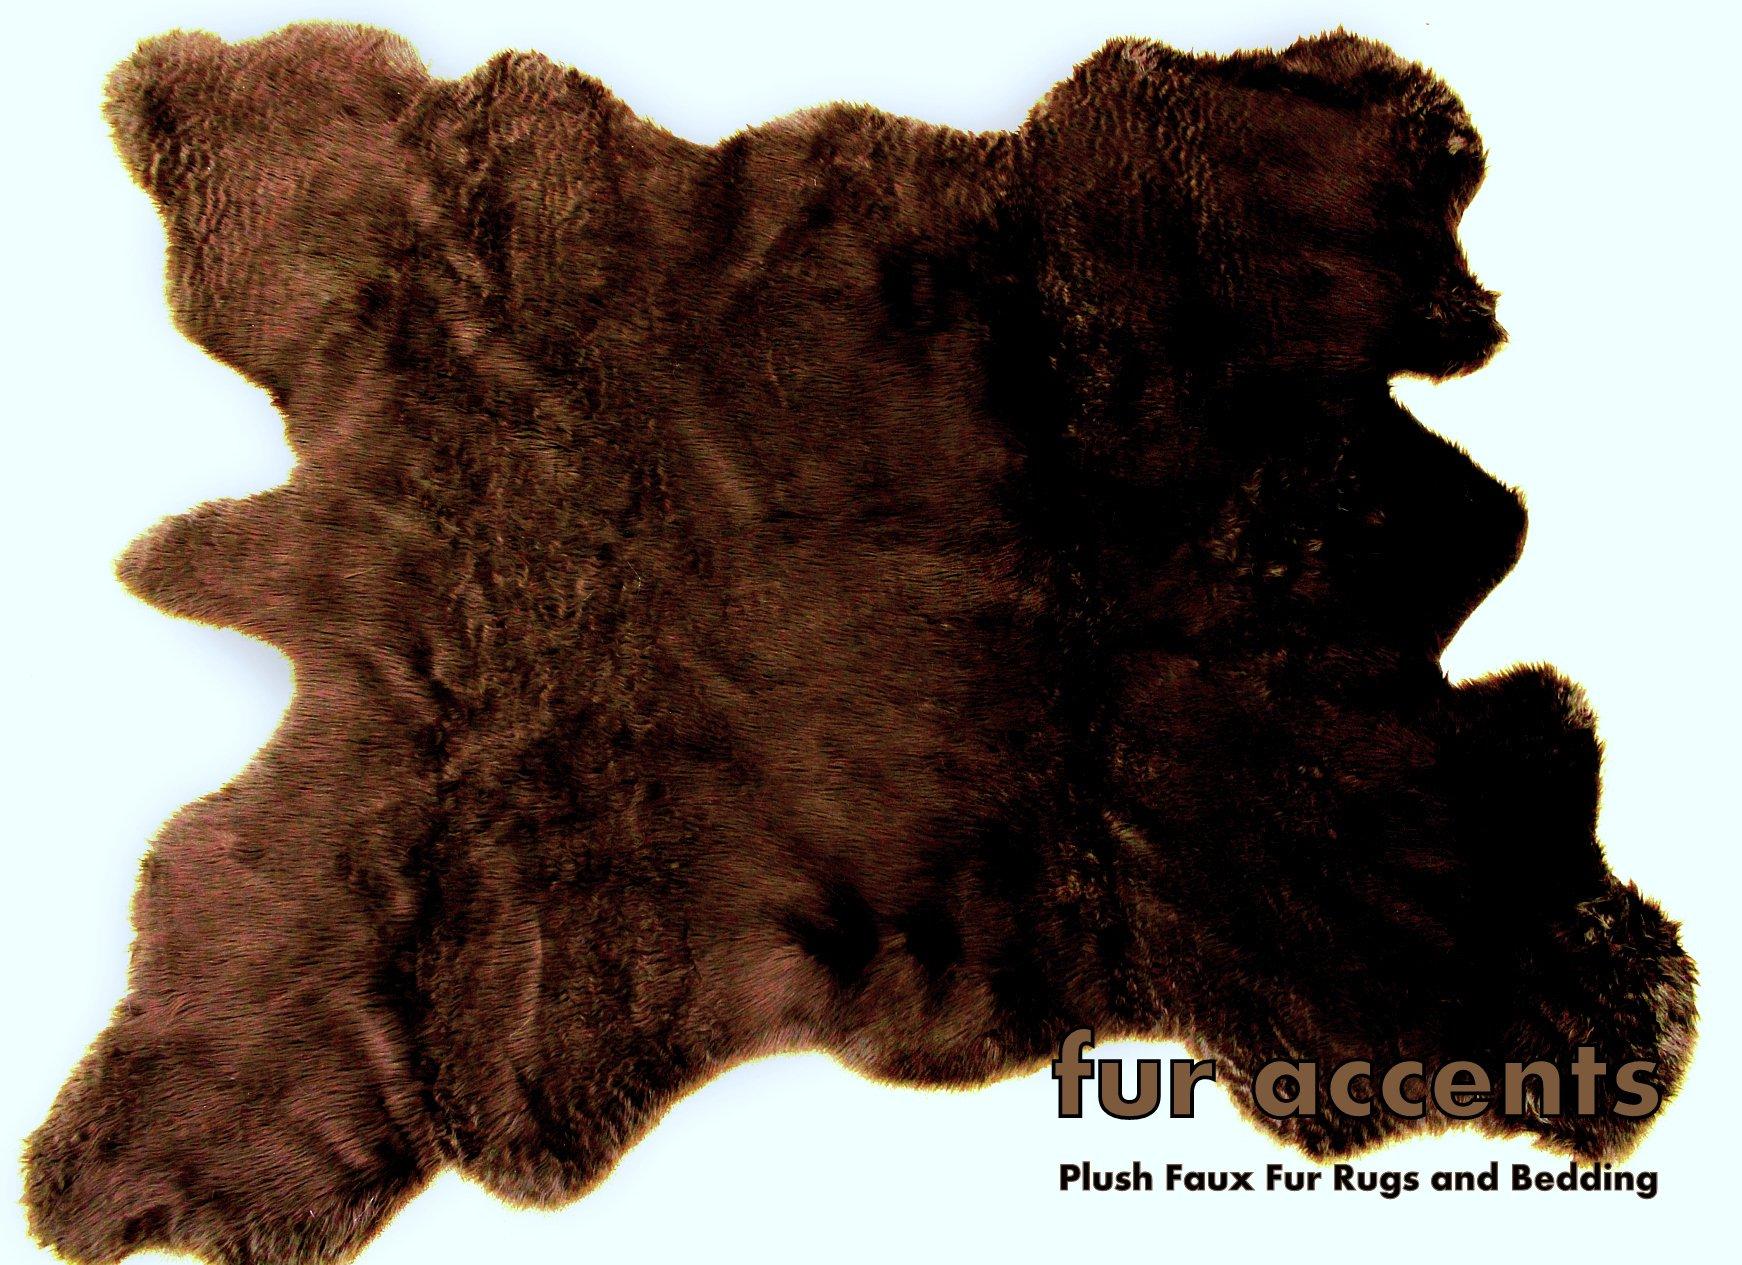 Fur Accents Faux Fur Buffalo Hide Pelt Rug (Brown)